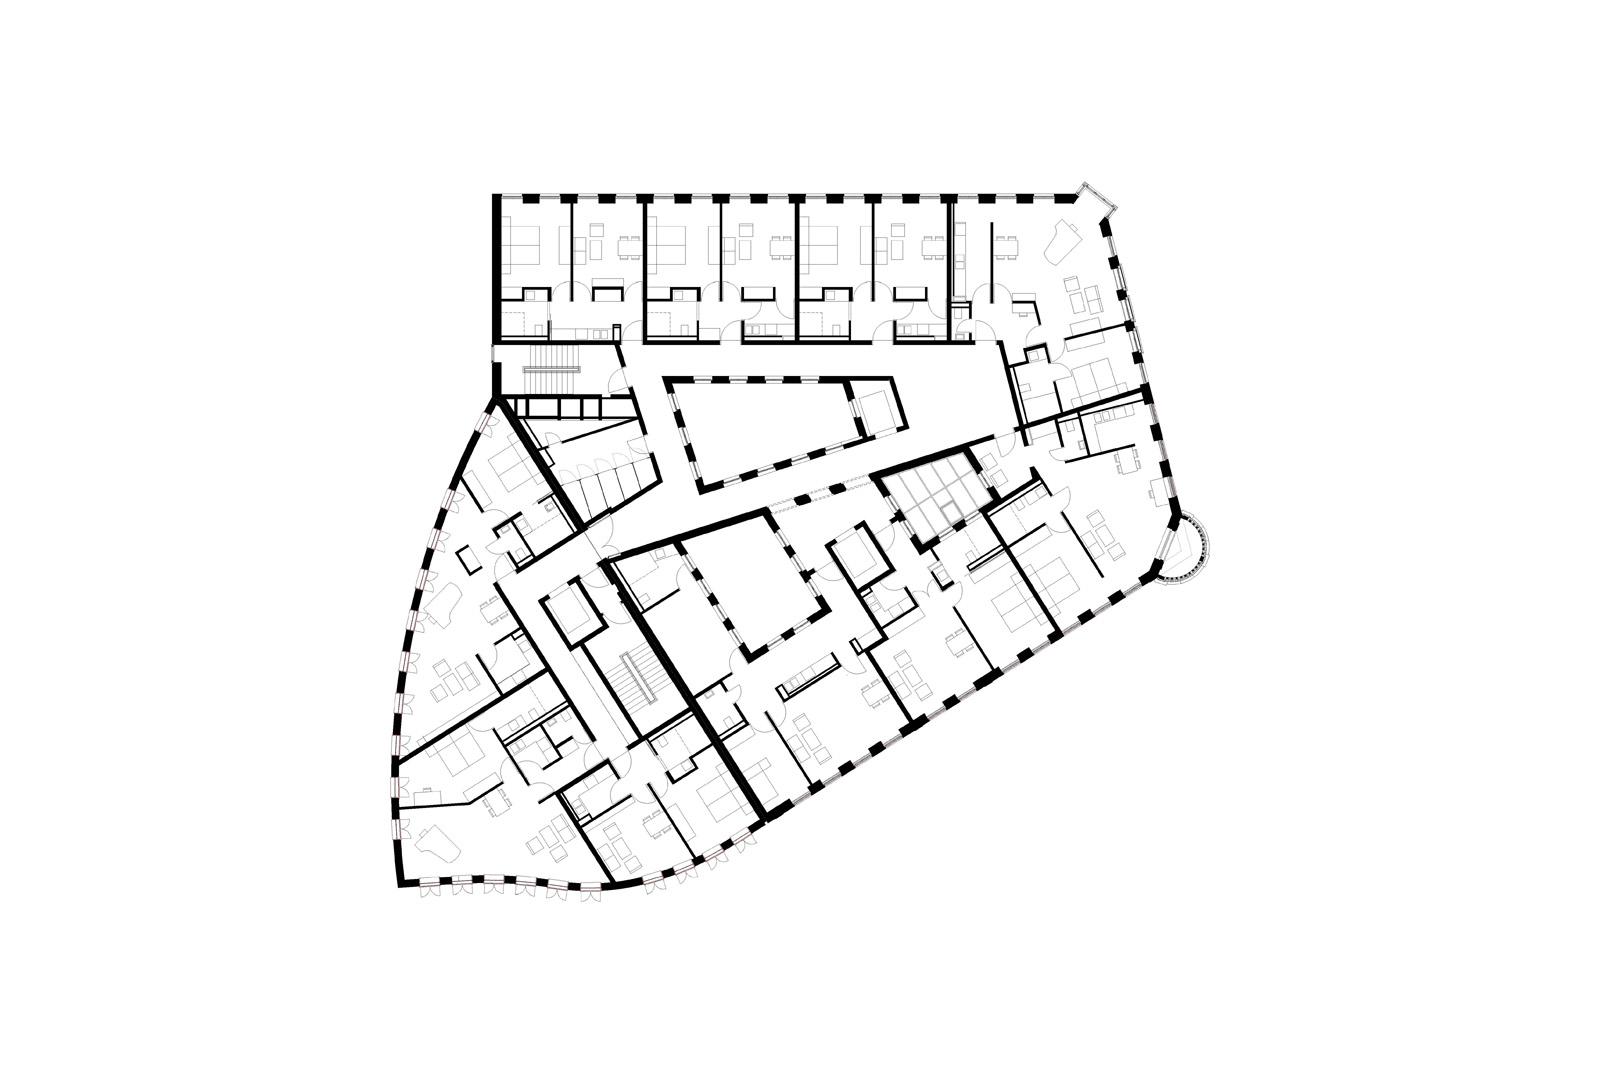 img-5512